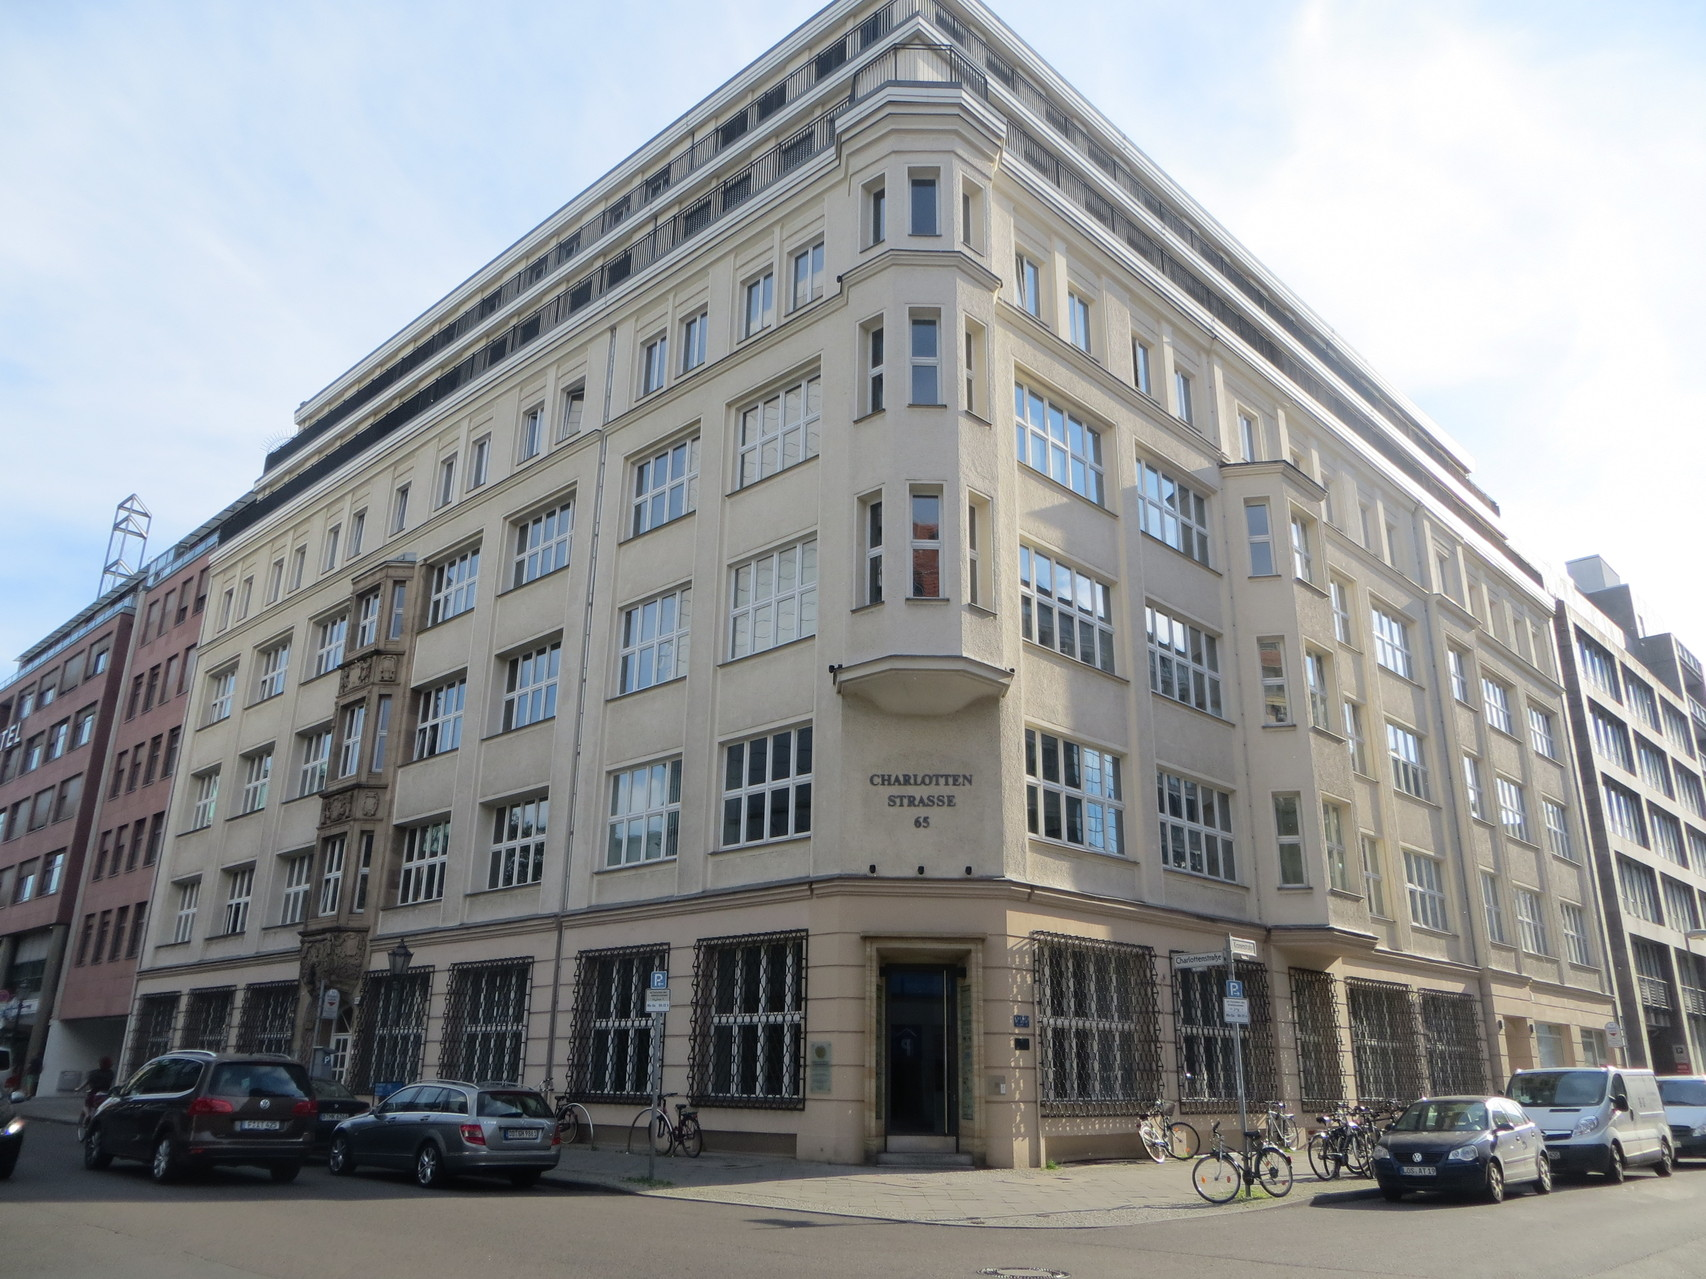 Steuerbüro Charlottenstraße Berlin